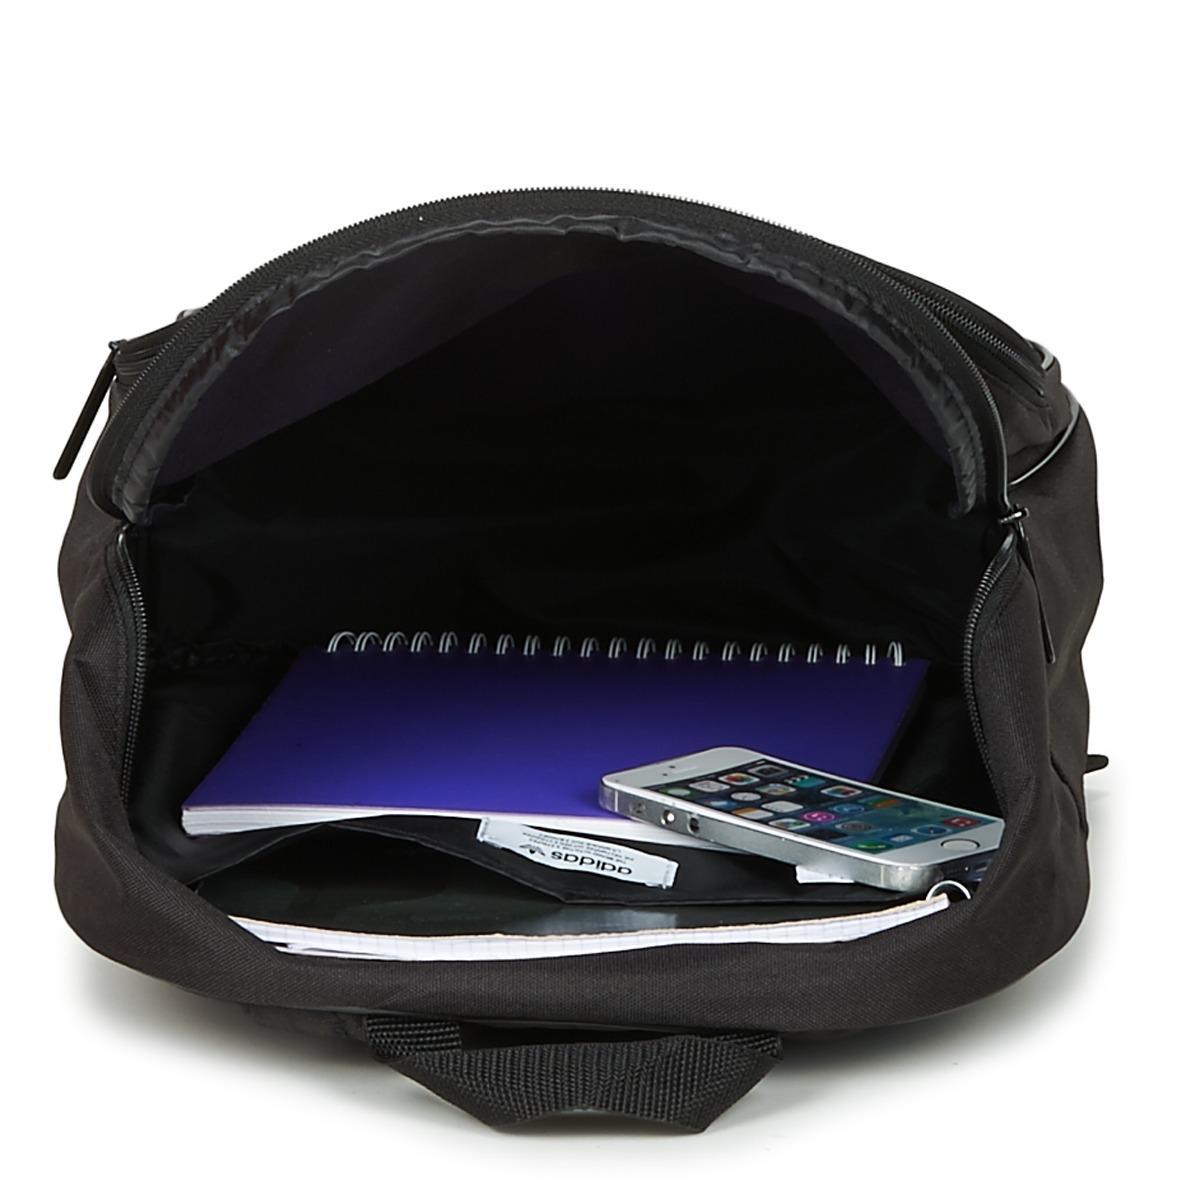 6eb37346185 Adidas - Bp Clas Trefoil Women s Backpack In Black for Men - Lyst. View  fullscreen